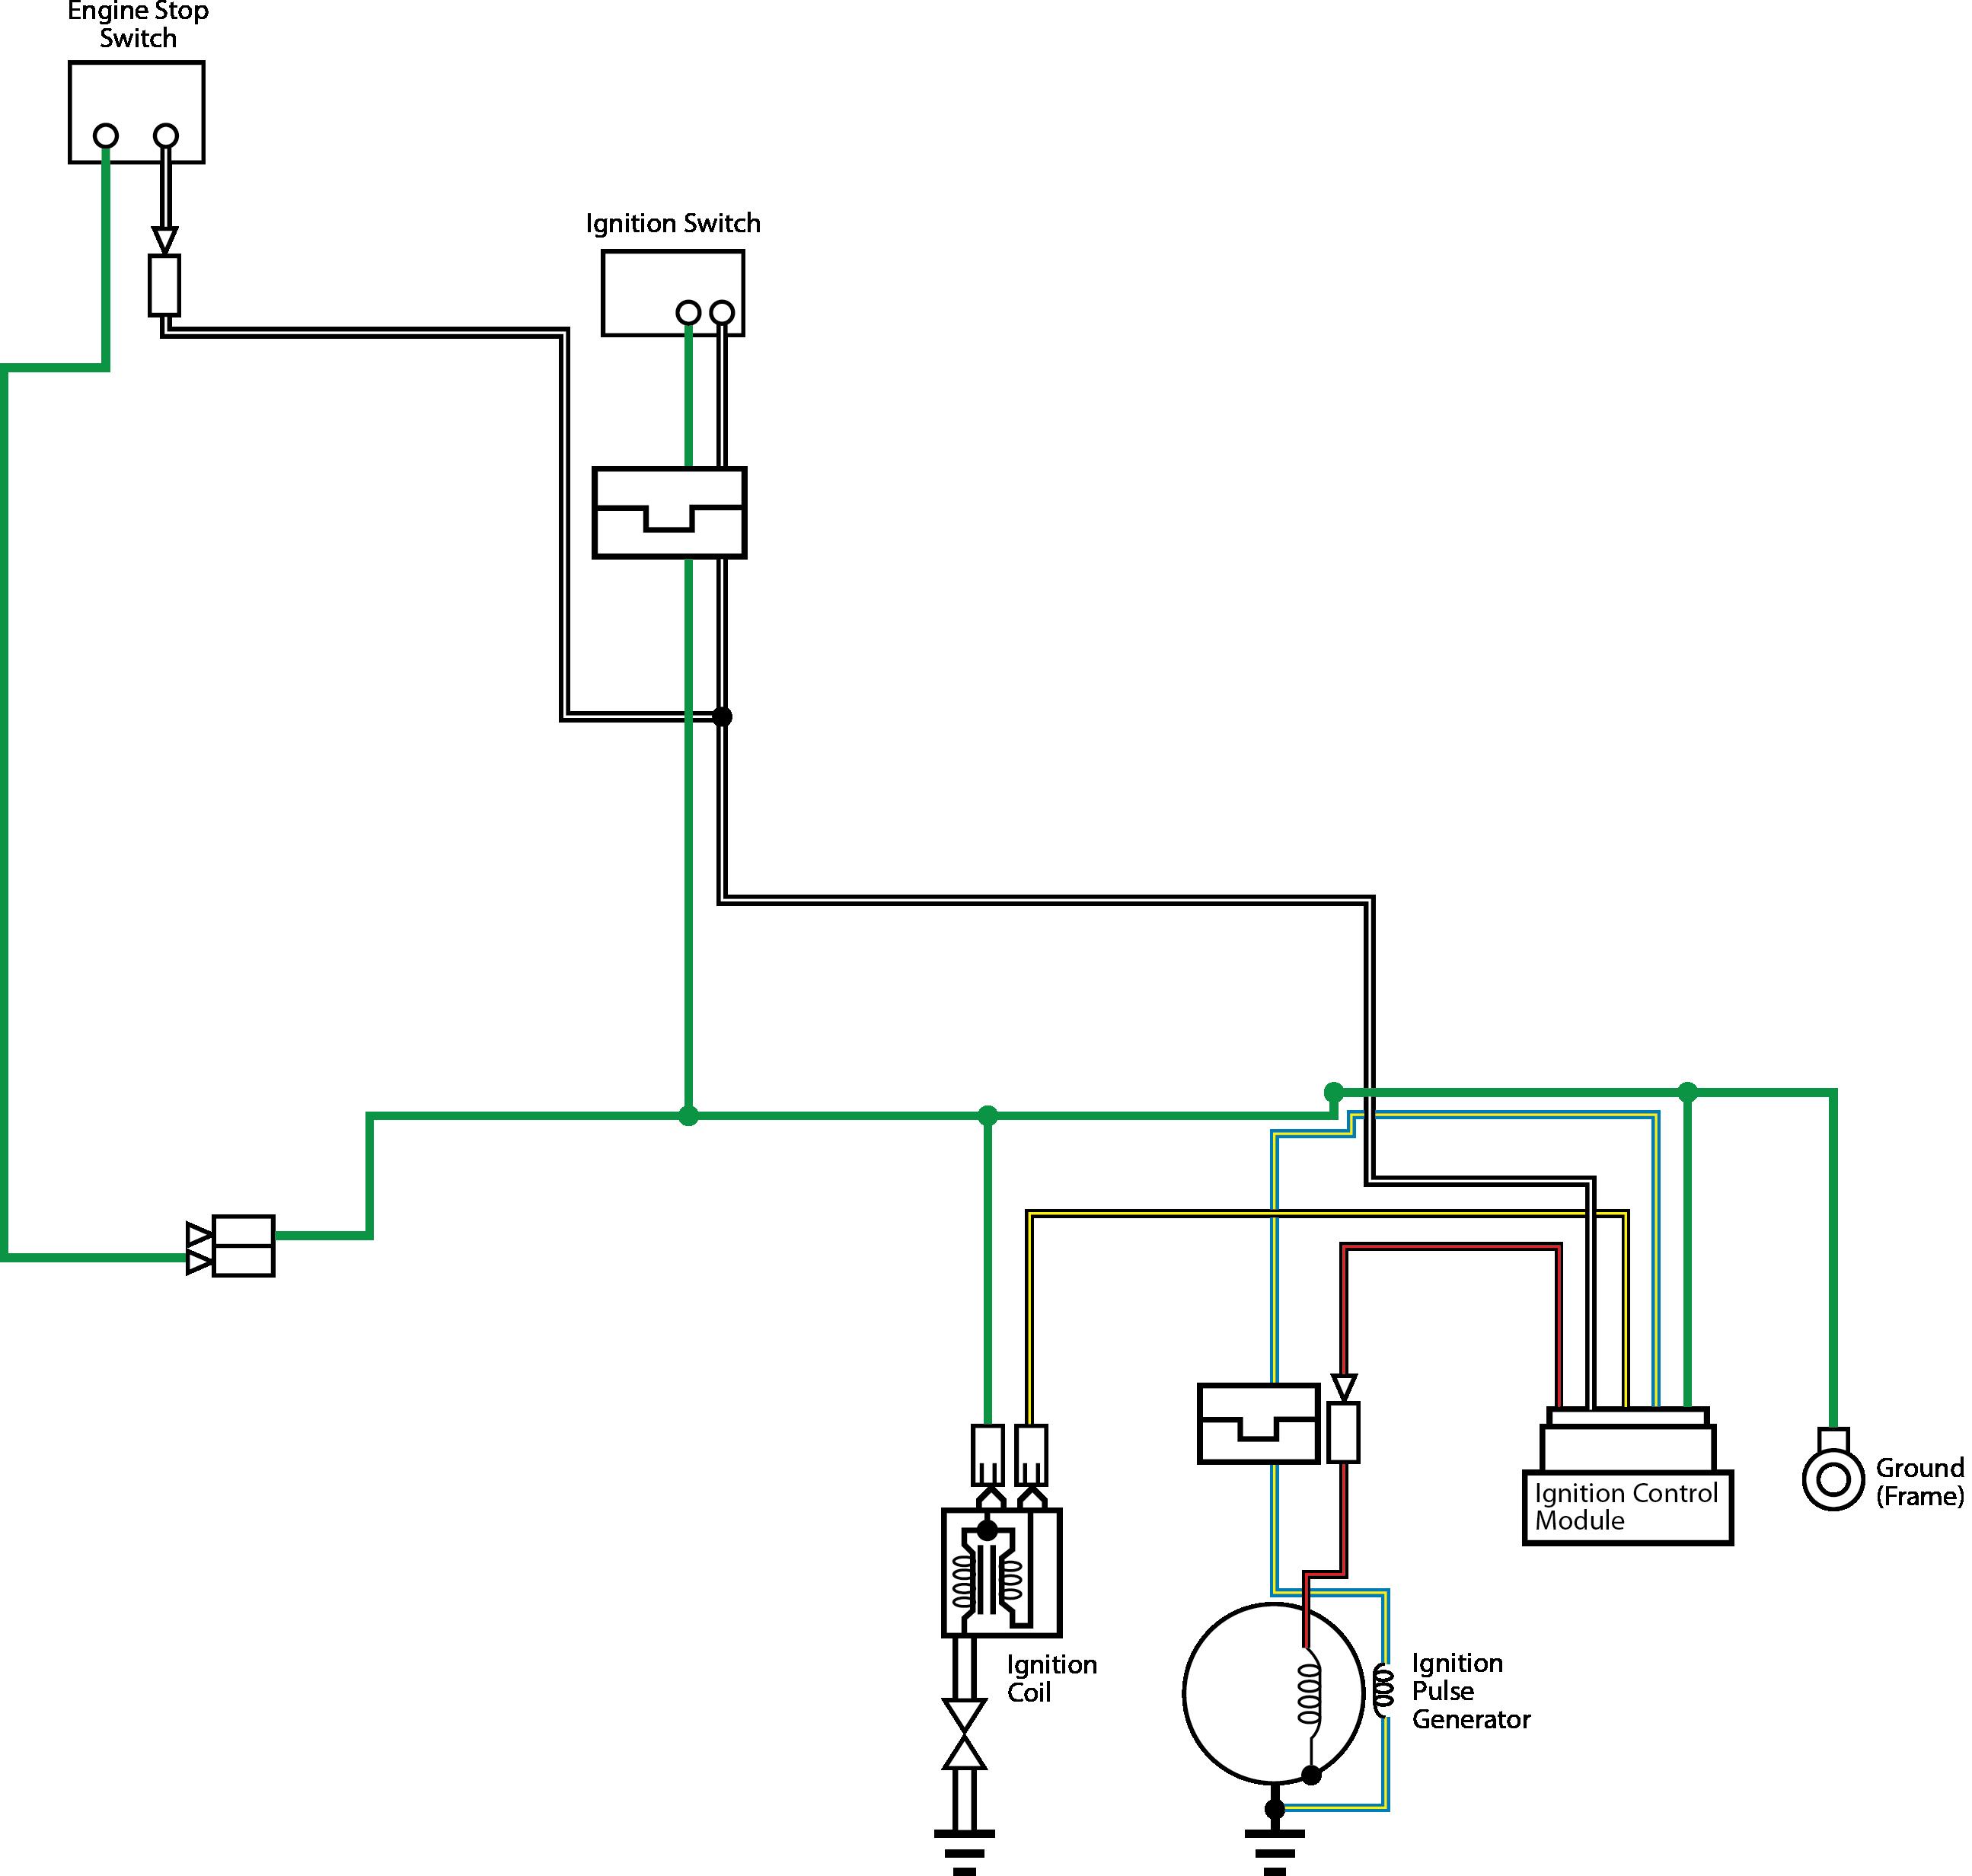 klx 110 wiring diagram klx 110 wiring diagram klx wiring diagrams honda 50cc dirt bike wire diagram honda auto wiring